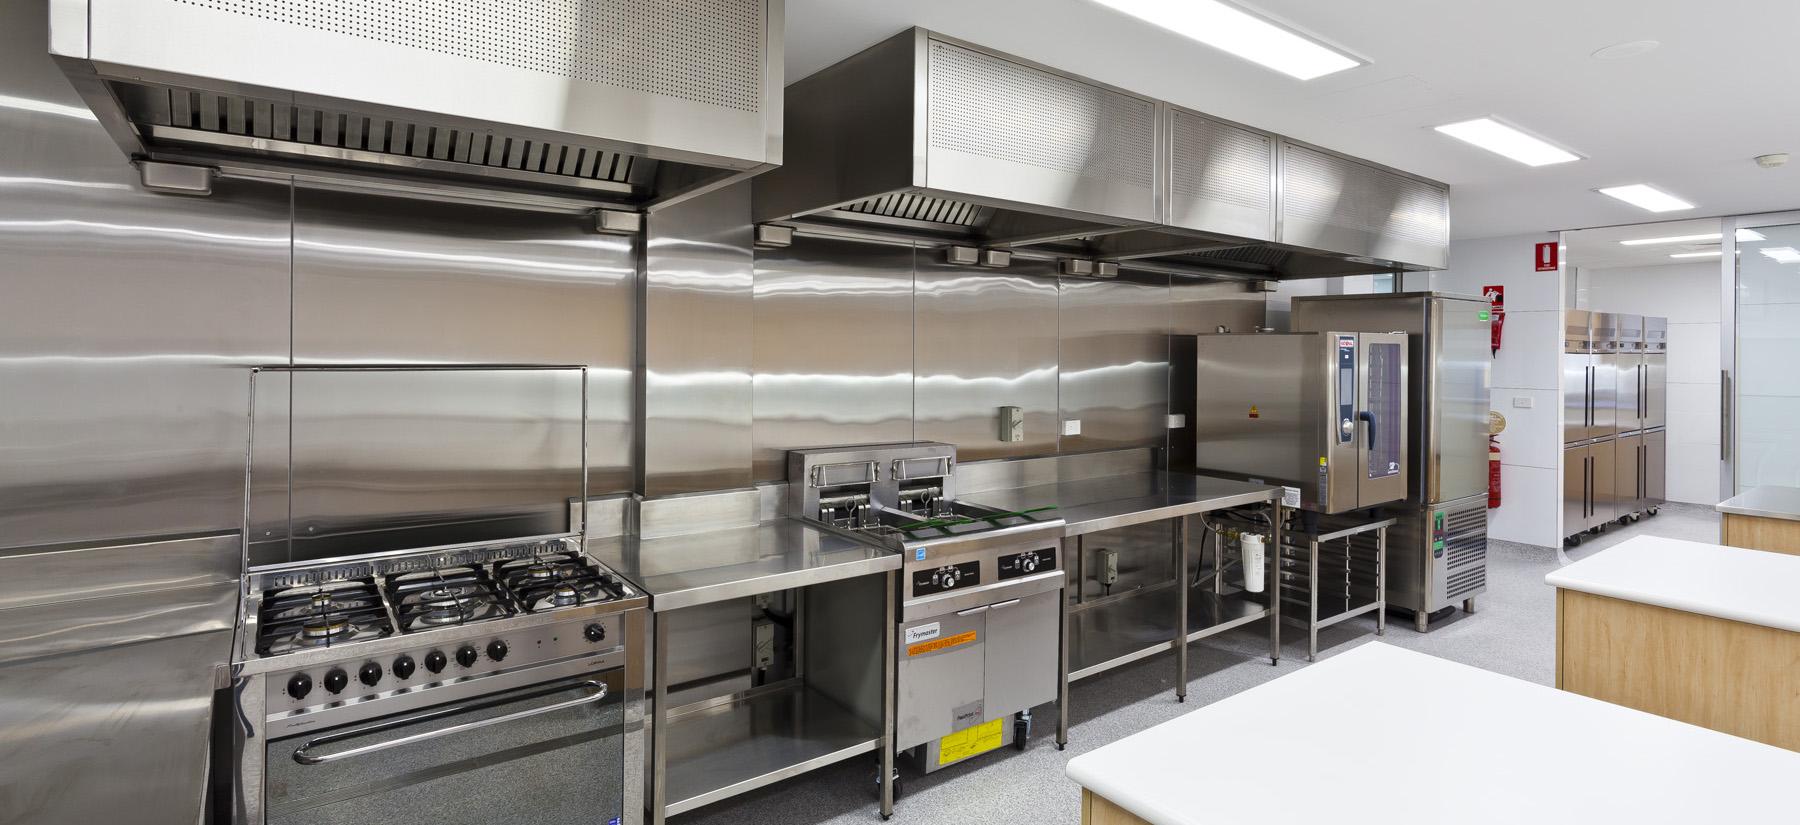 kitchen appliance parts dutch boy and bath paint commercial repair service in coral gables